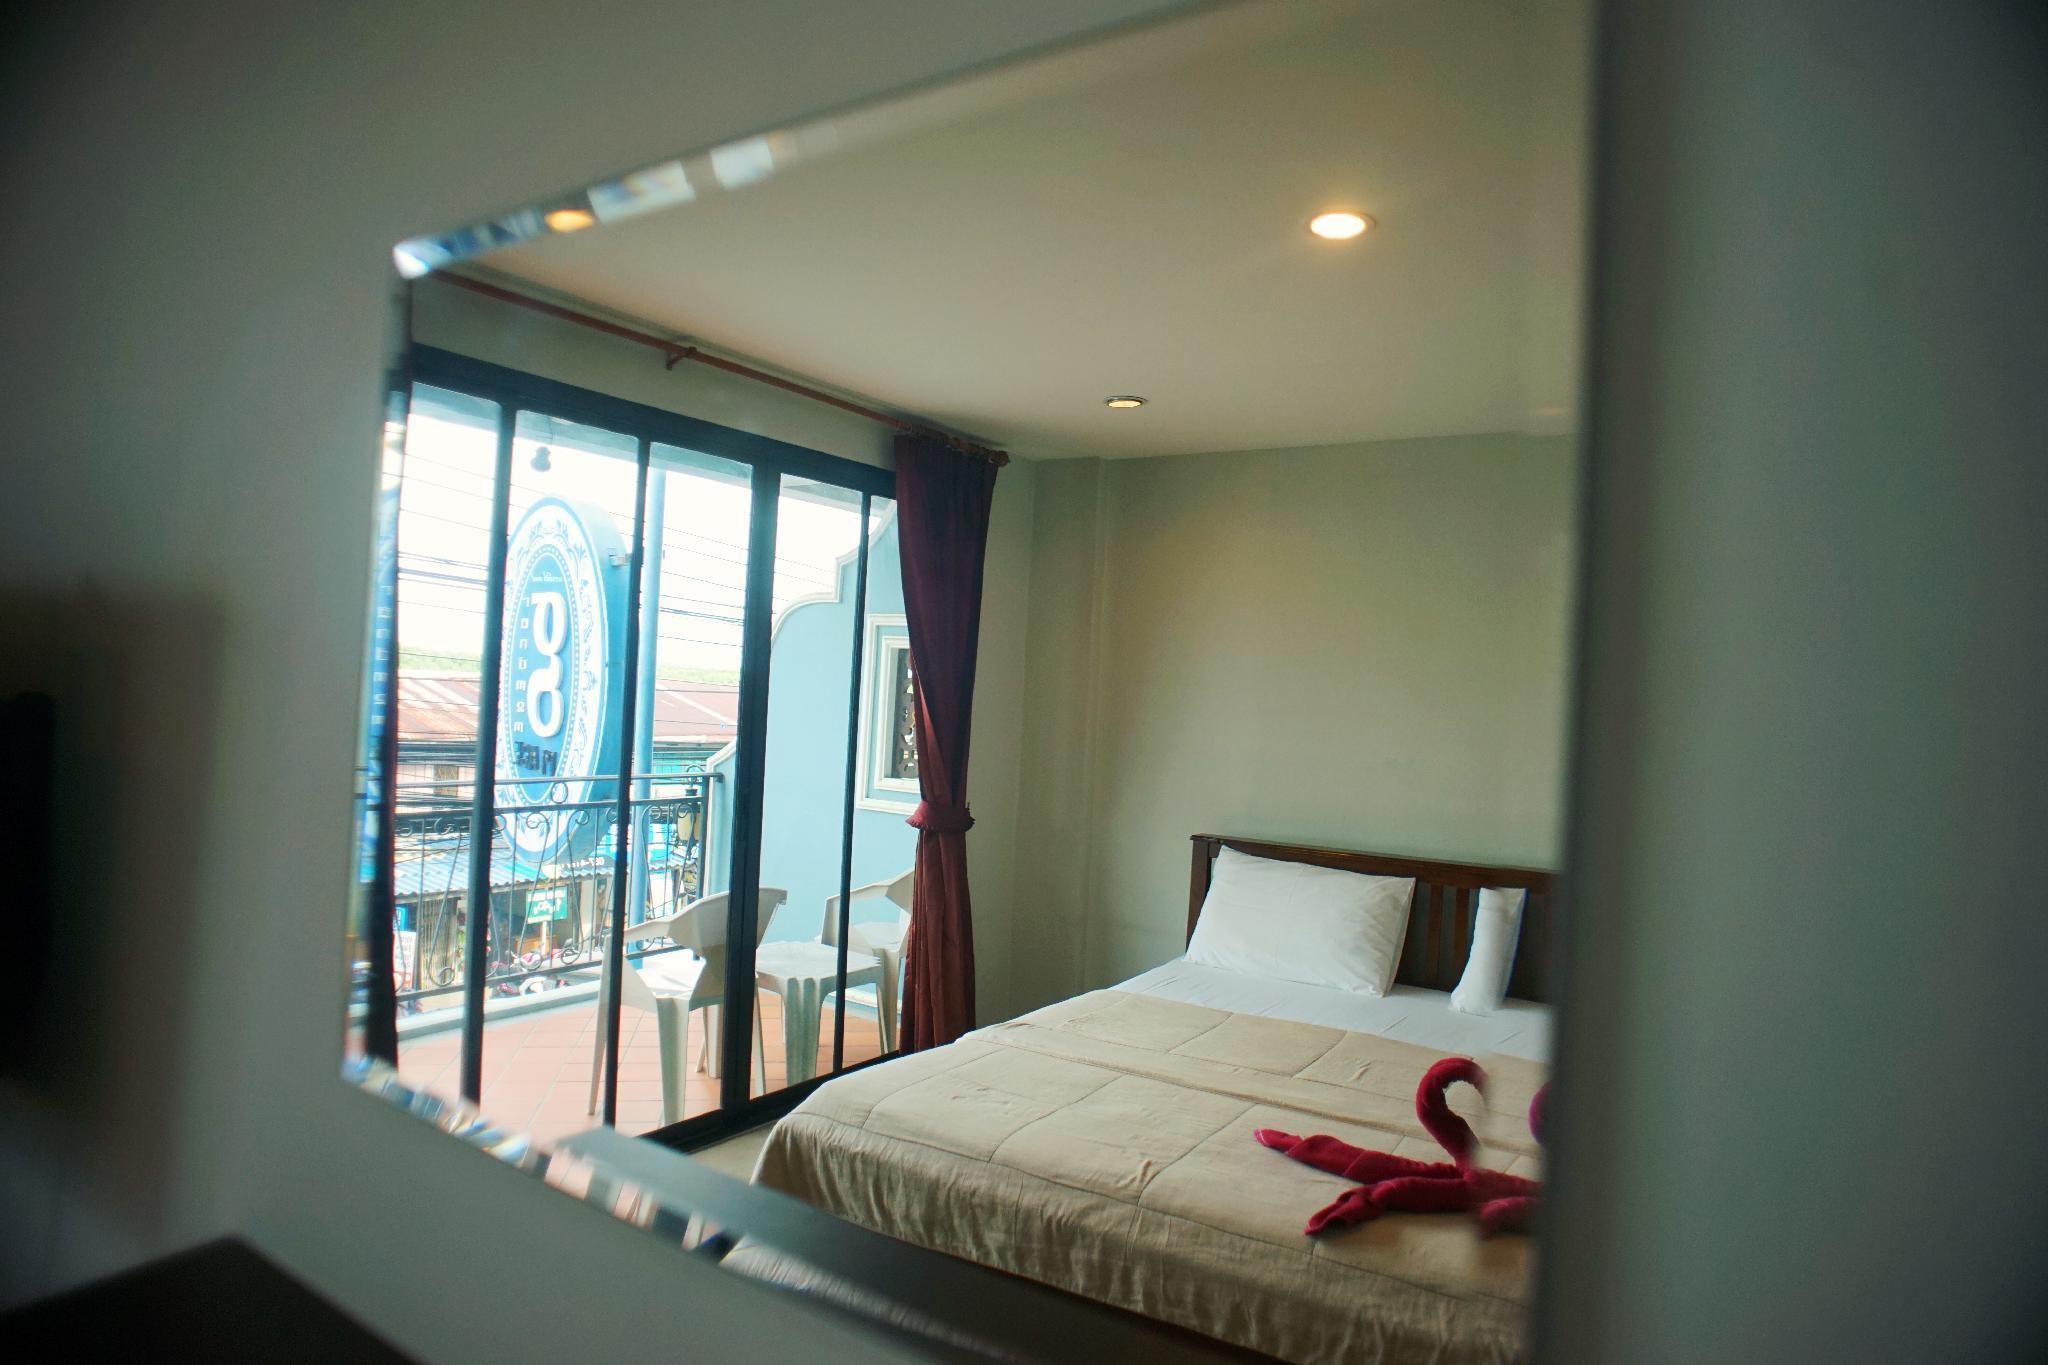 Grandmom Place Krabi อพาร์ตเมนต์ 1 ห้องนอน 1 ห้องน้ำส่วนตัว ขนาด 30 ตร.ม. – ตัวเมืองกระบี่